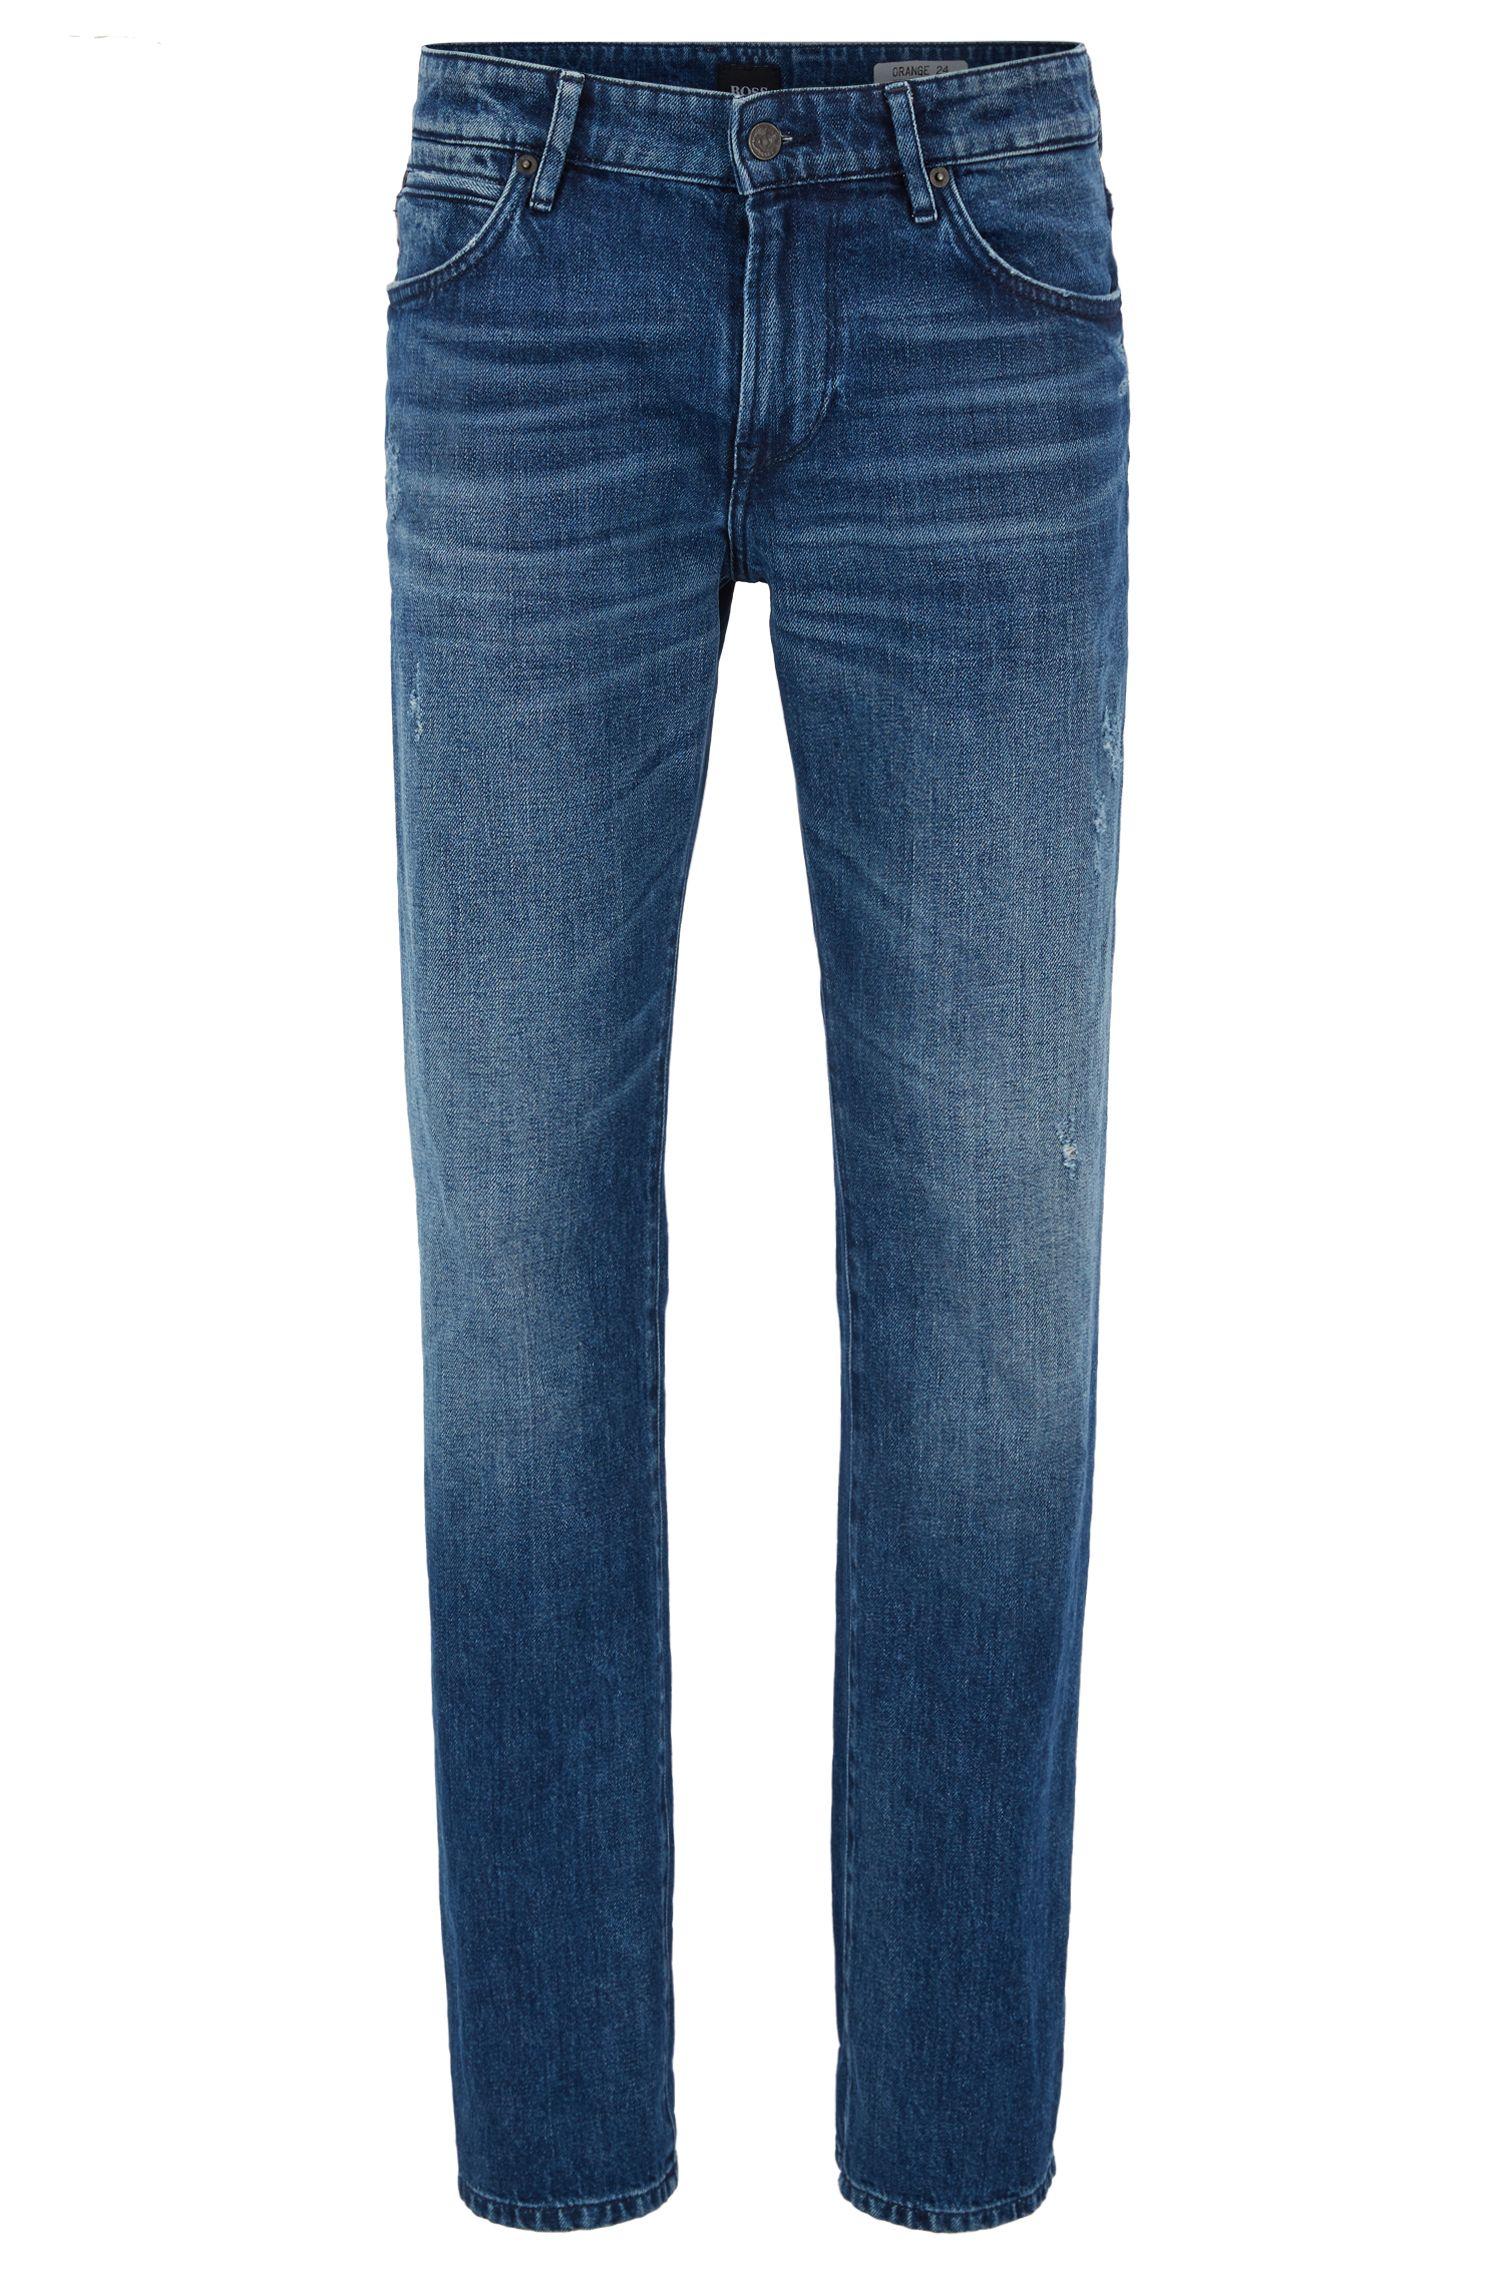 Jeans regular fit in red-cast denim